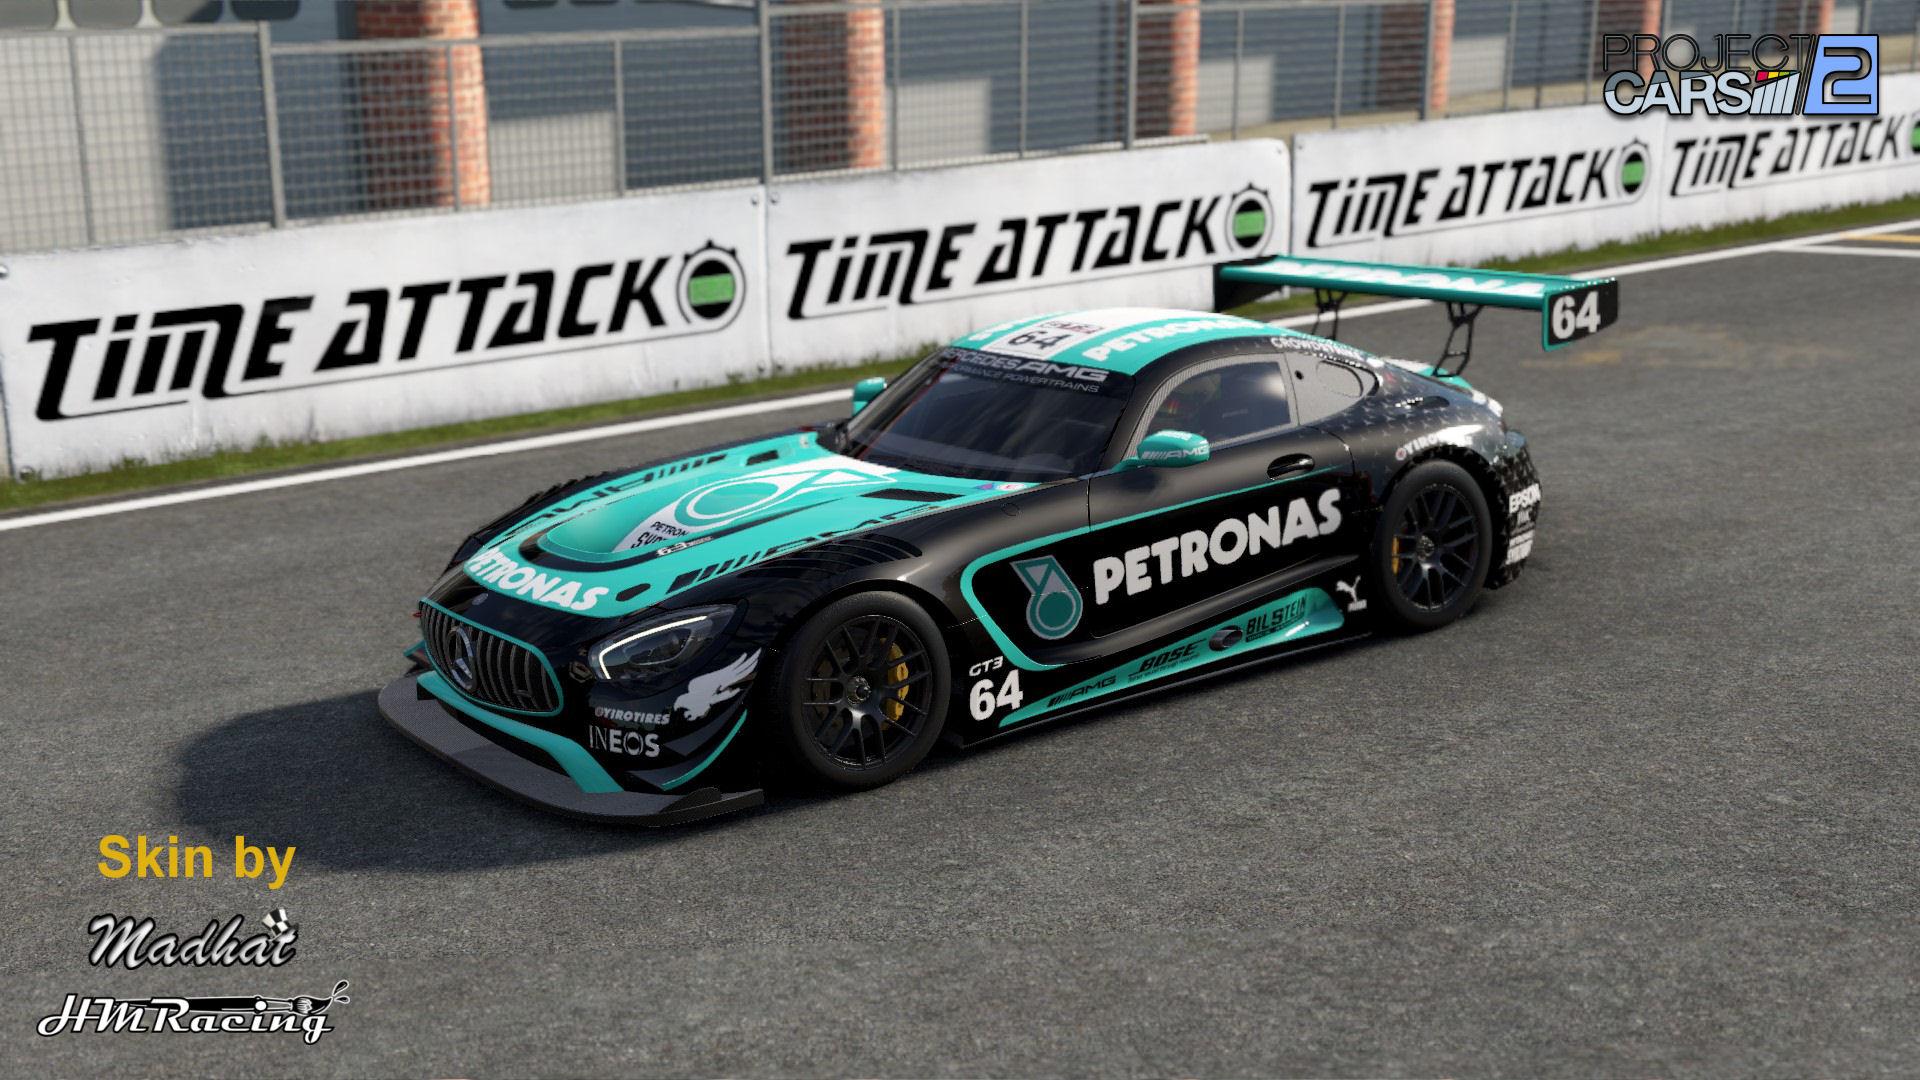 Mercedes AMG GT3 Petronas black 01.jpg